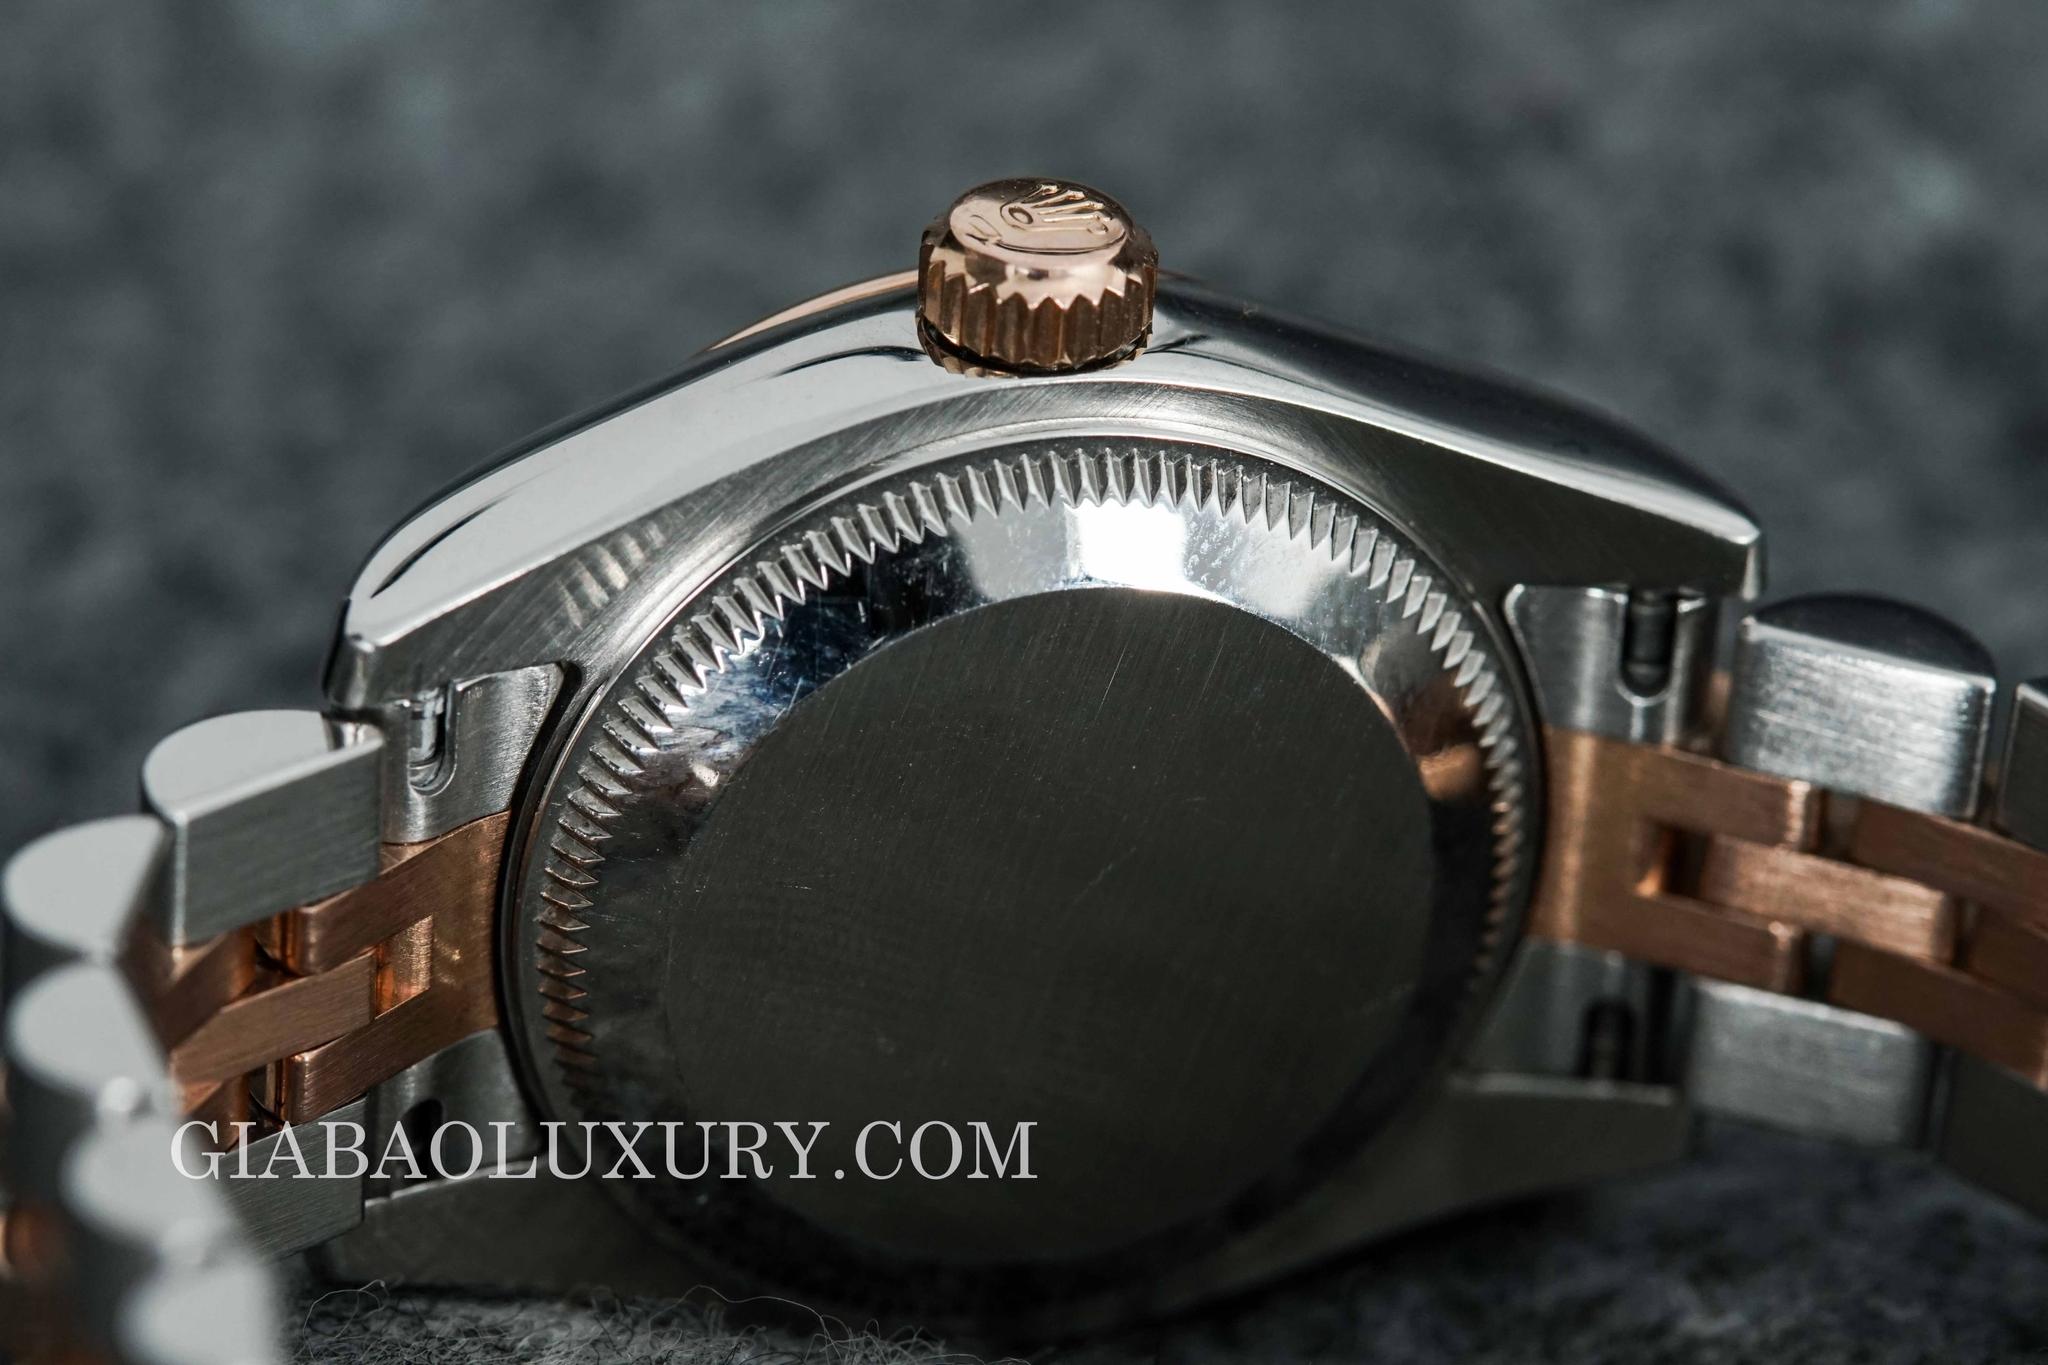 đồng hồ rolex datejust 179171